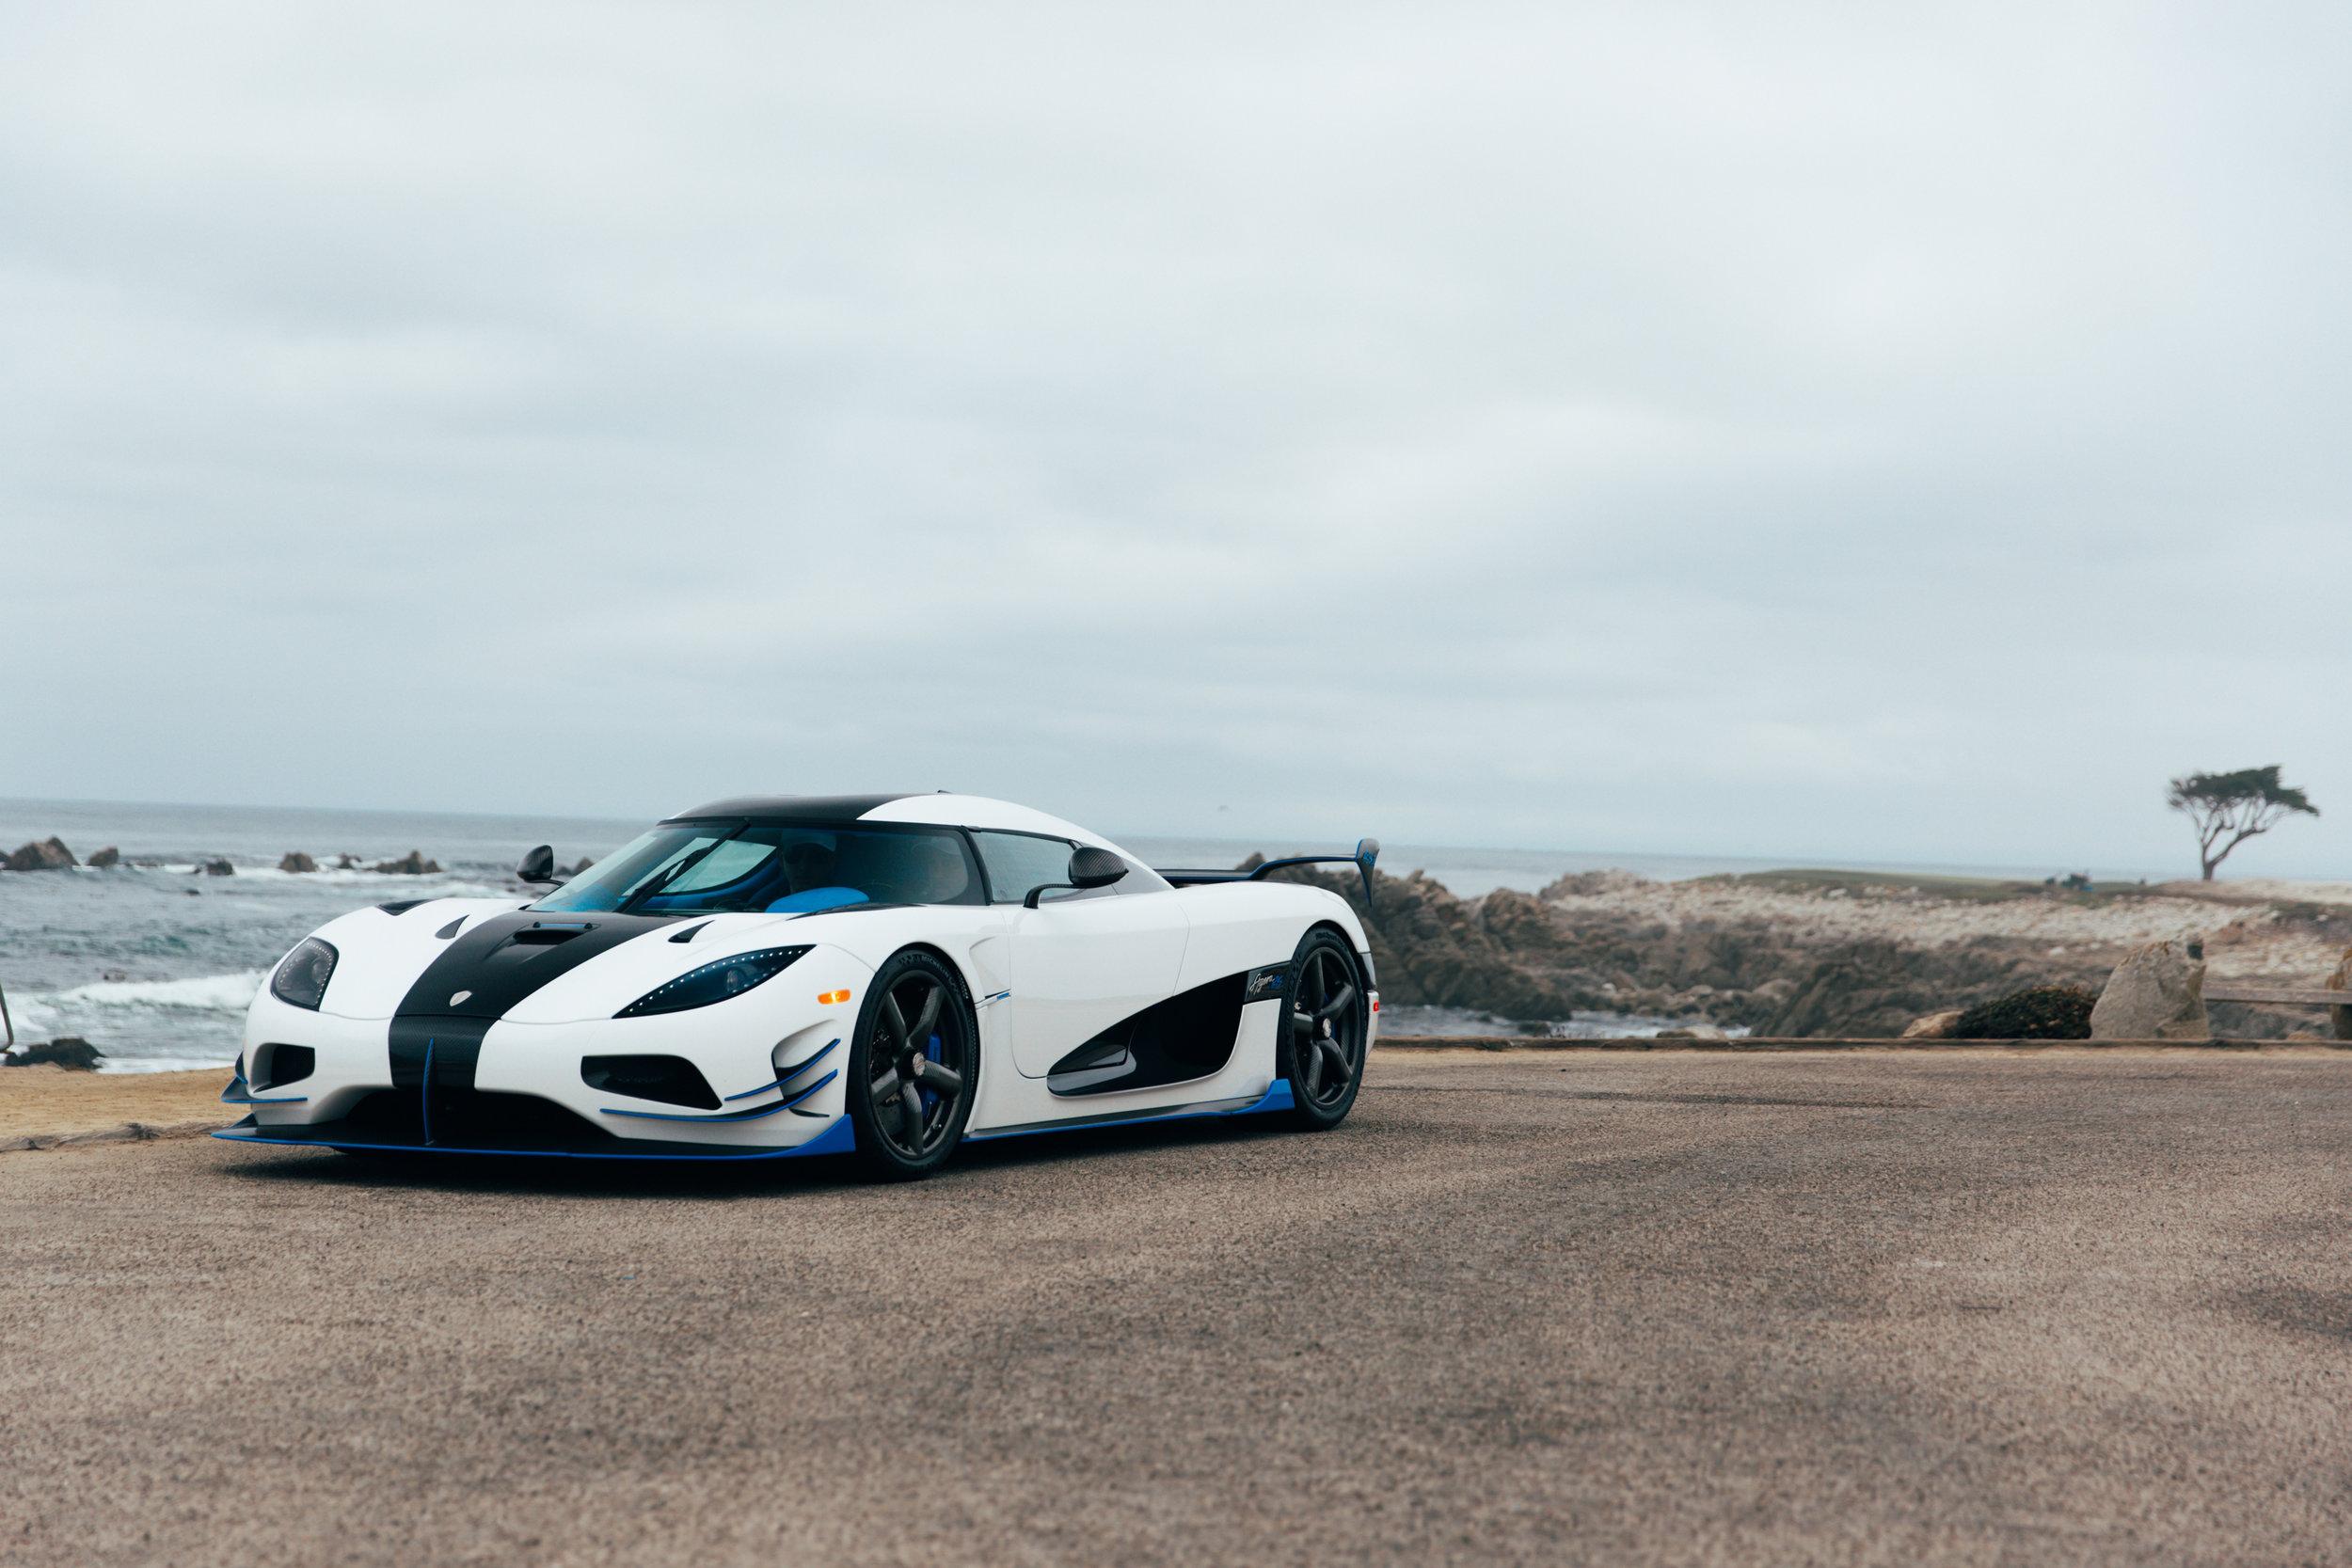 Stay_Driven_Monterey_Car_Week_Whitesse_Koenigsegg-41.jpg